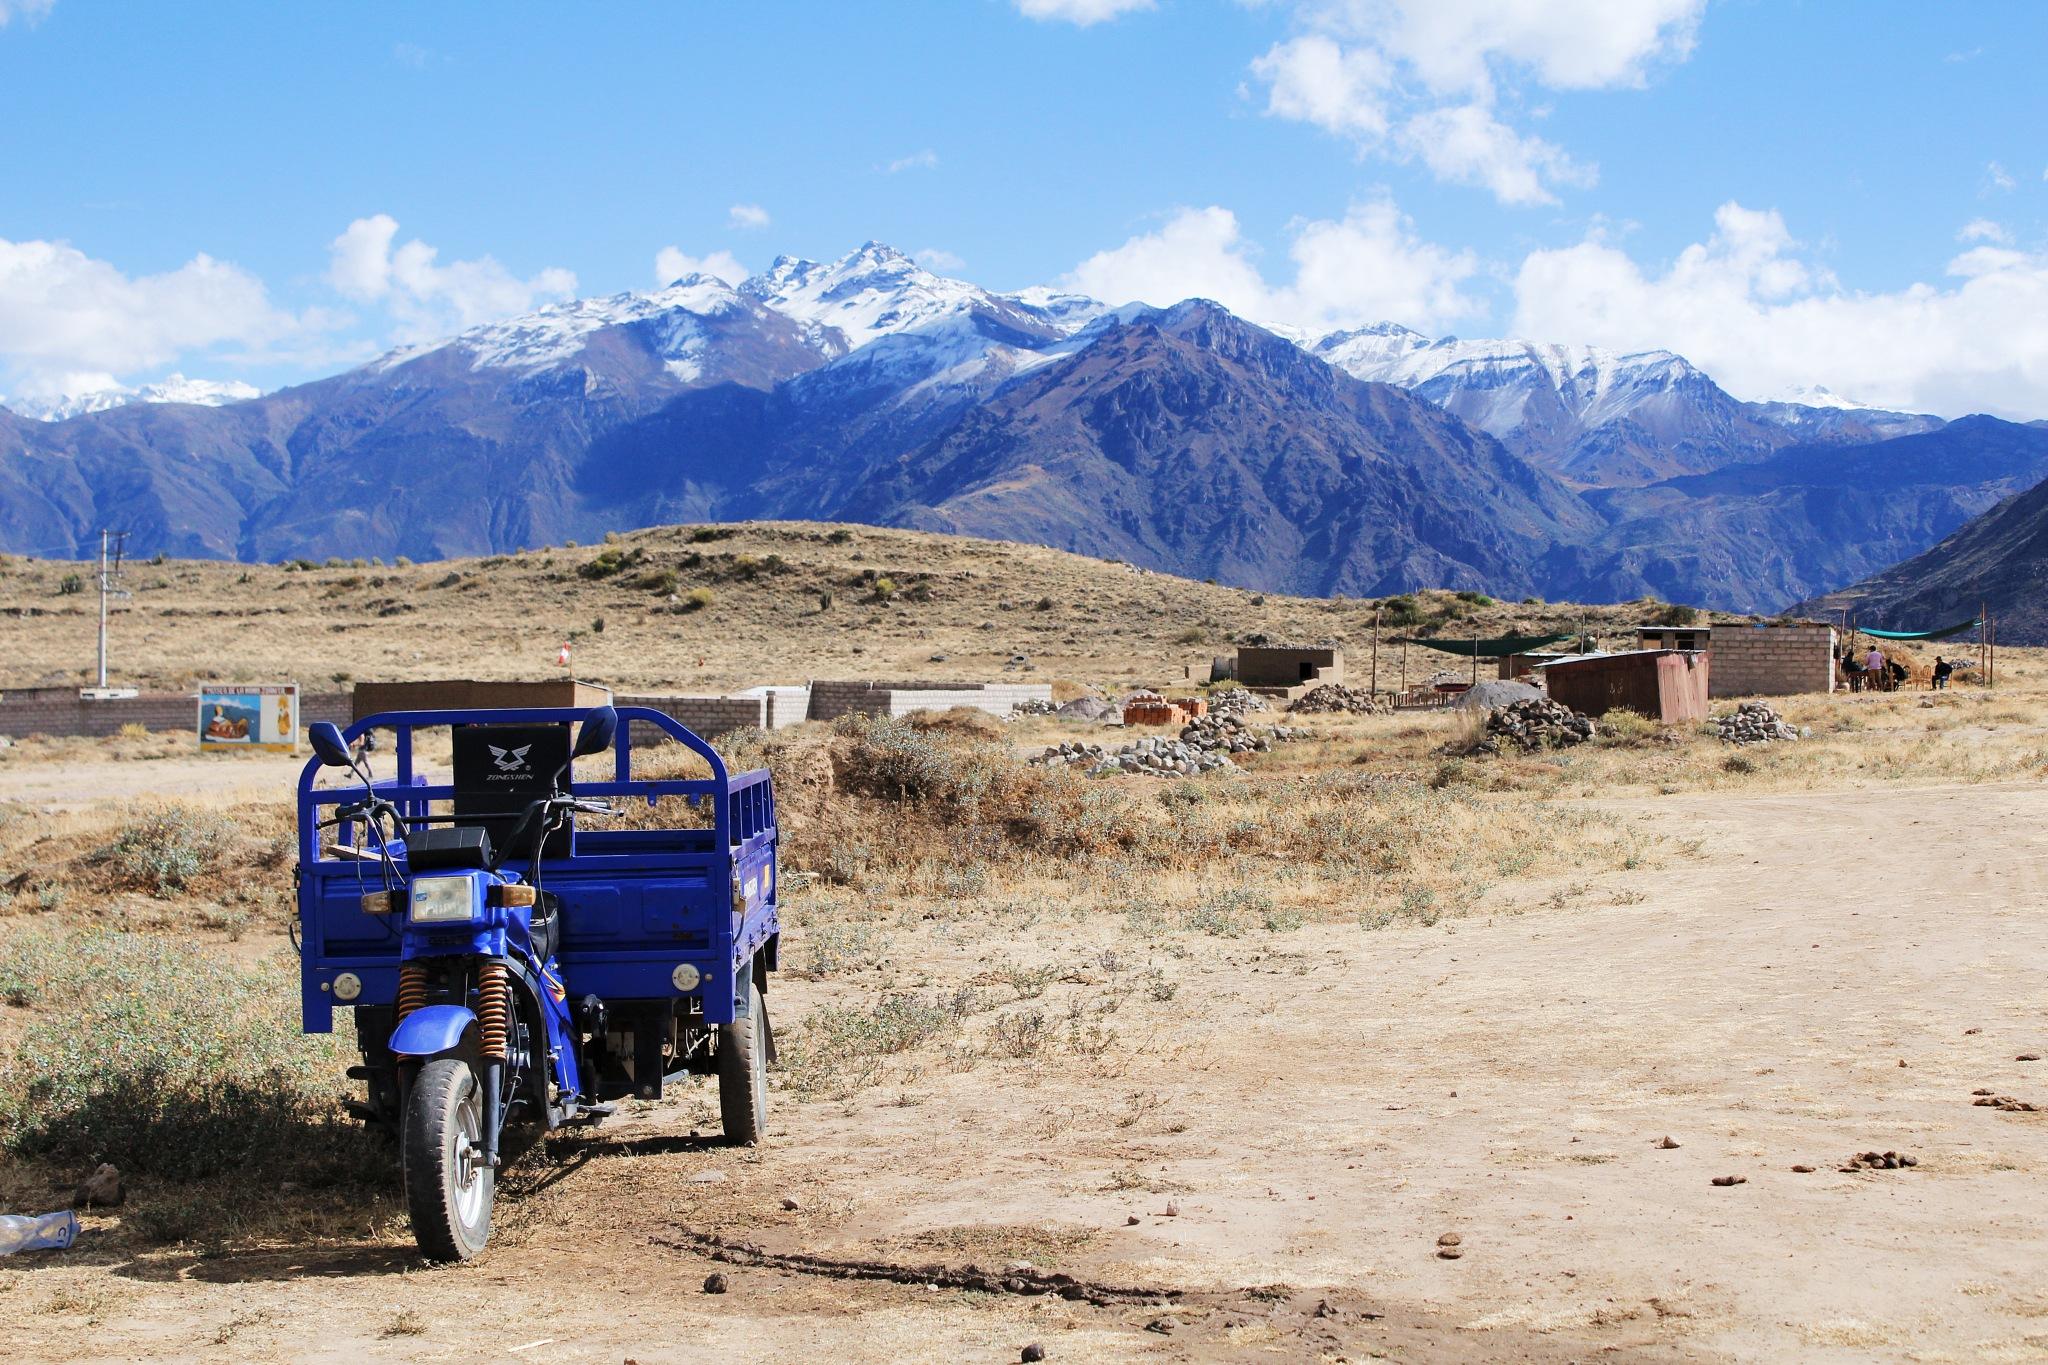 Photo in Landscape #mountain #mountains #motorbike #bikes #vehicle #dirt road #canon #canon rebel #nature #peru #south america #sudamerica #canyon #hike #hiking #blue